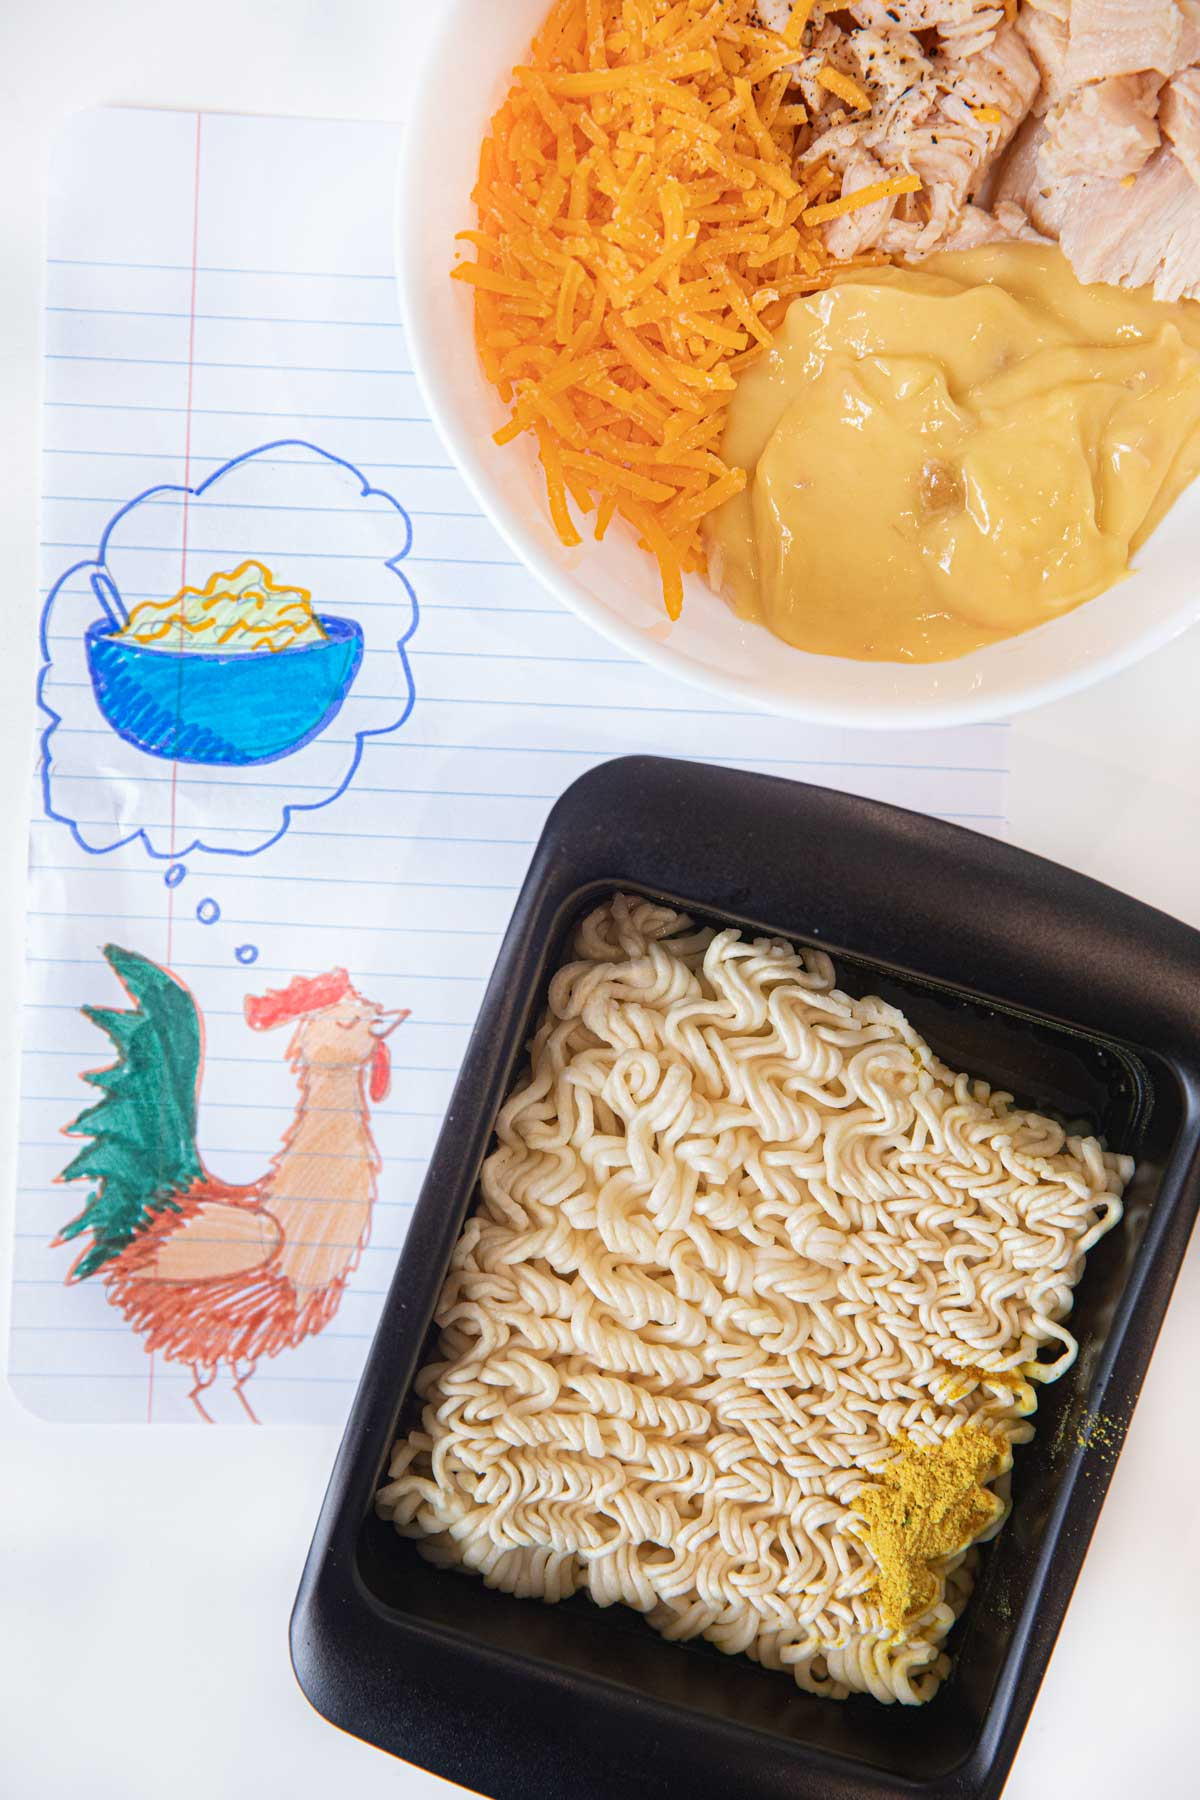 Creamy Cheesy Chicken Ramen ingredients in bowl and ramen cooker